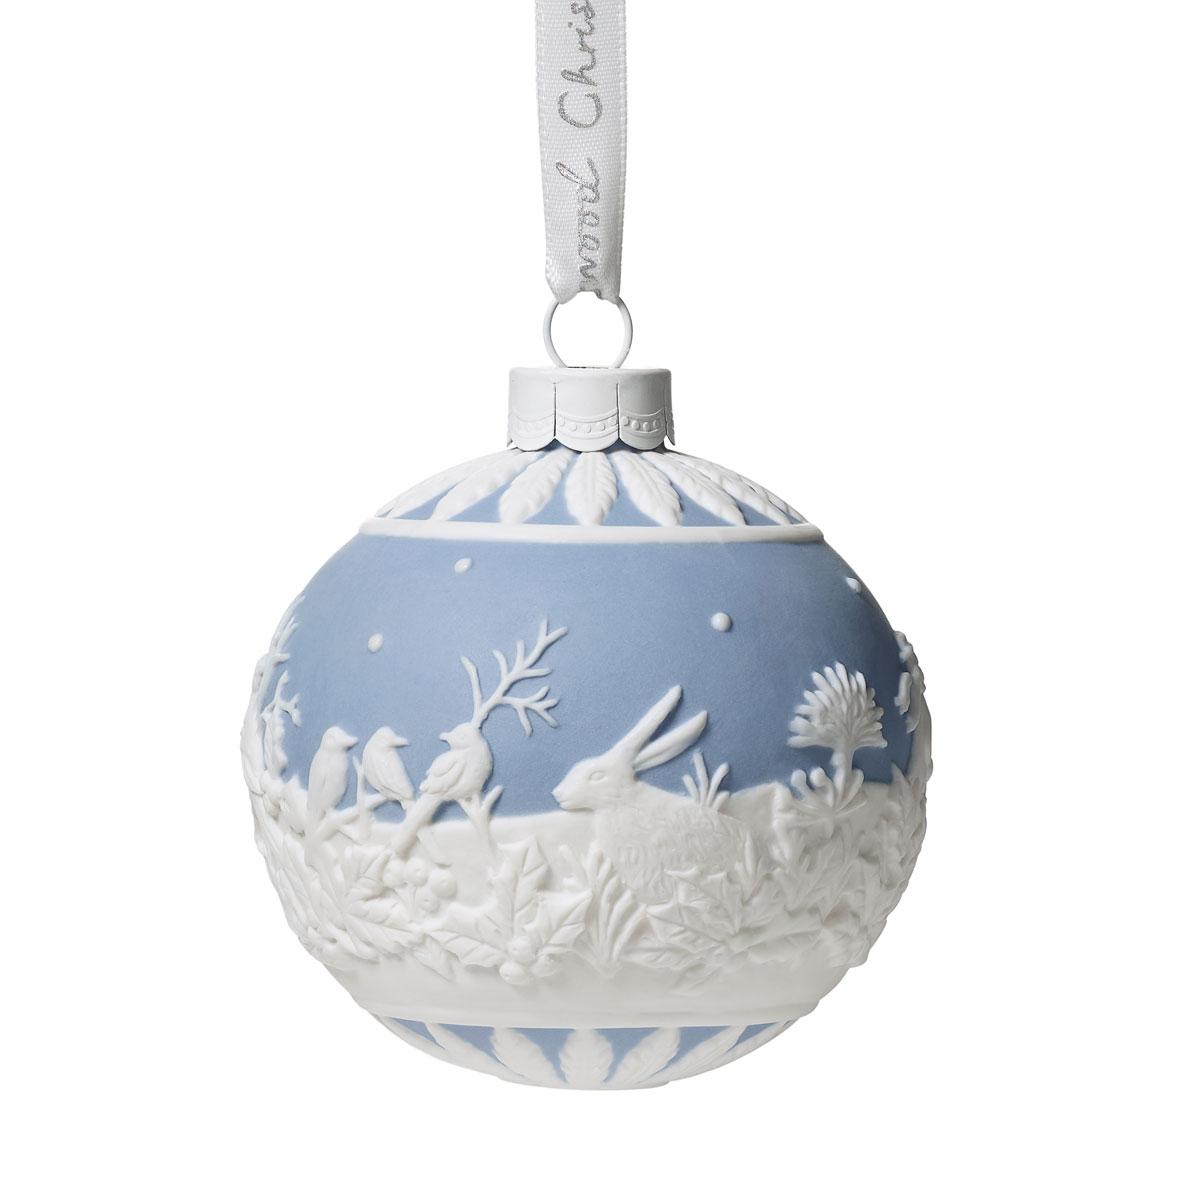 Wedgwood 2019 Winter Walk Christmas Ornament